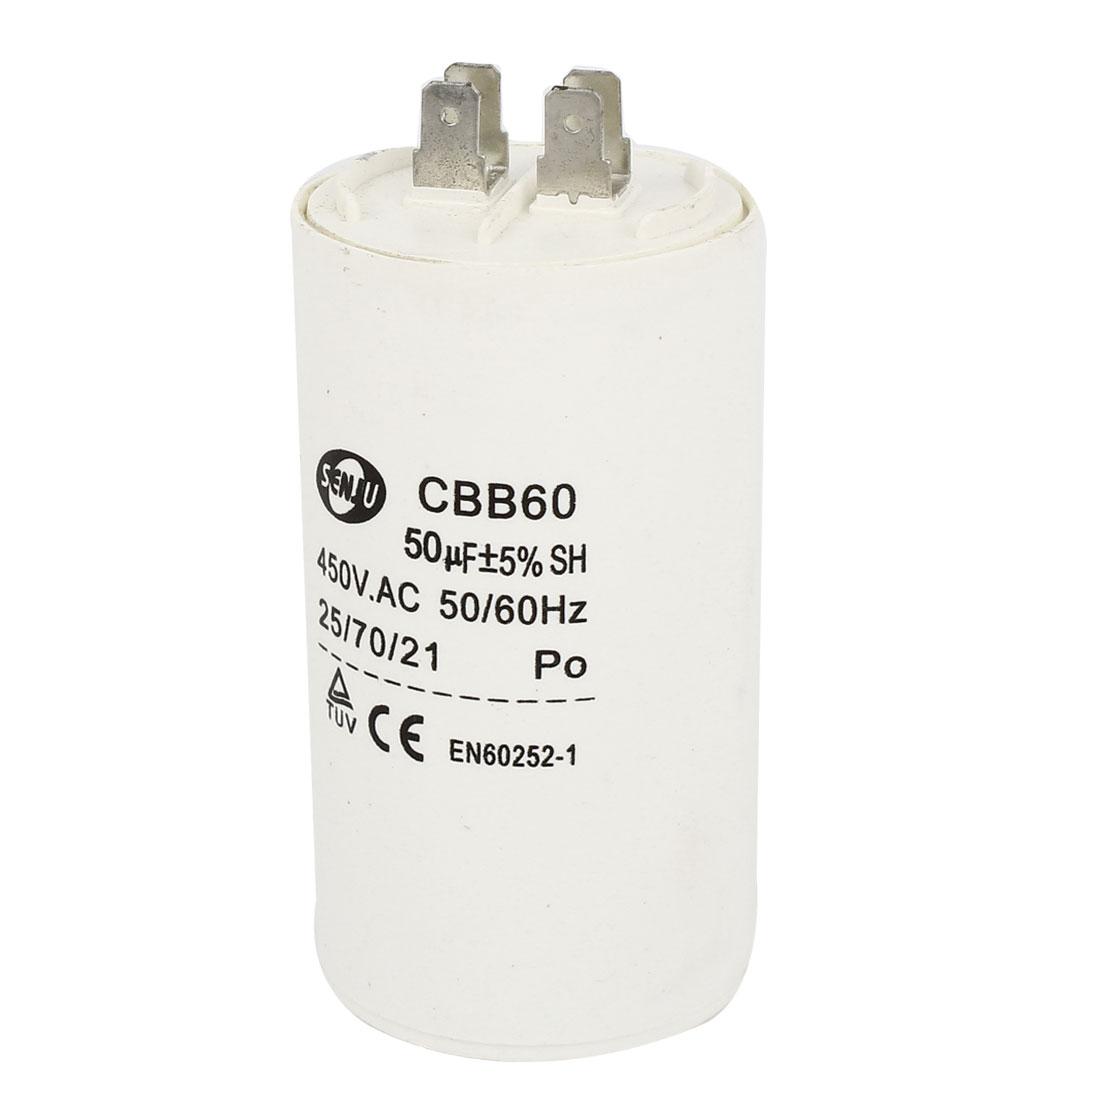 CBB60 AC 450V 50/60Hz 50uF Polypropylene Film Capacitor for Washing Machine